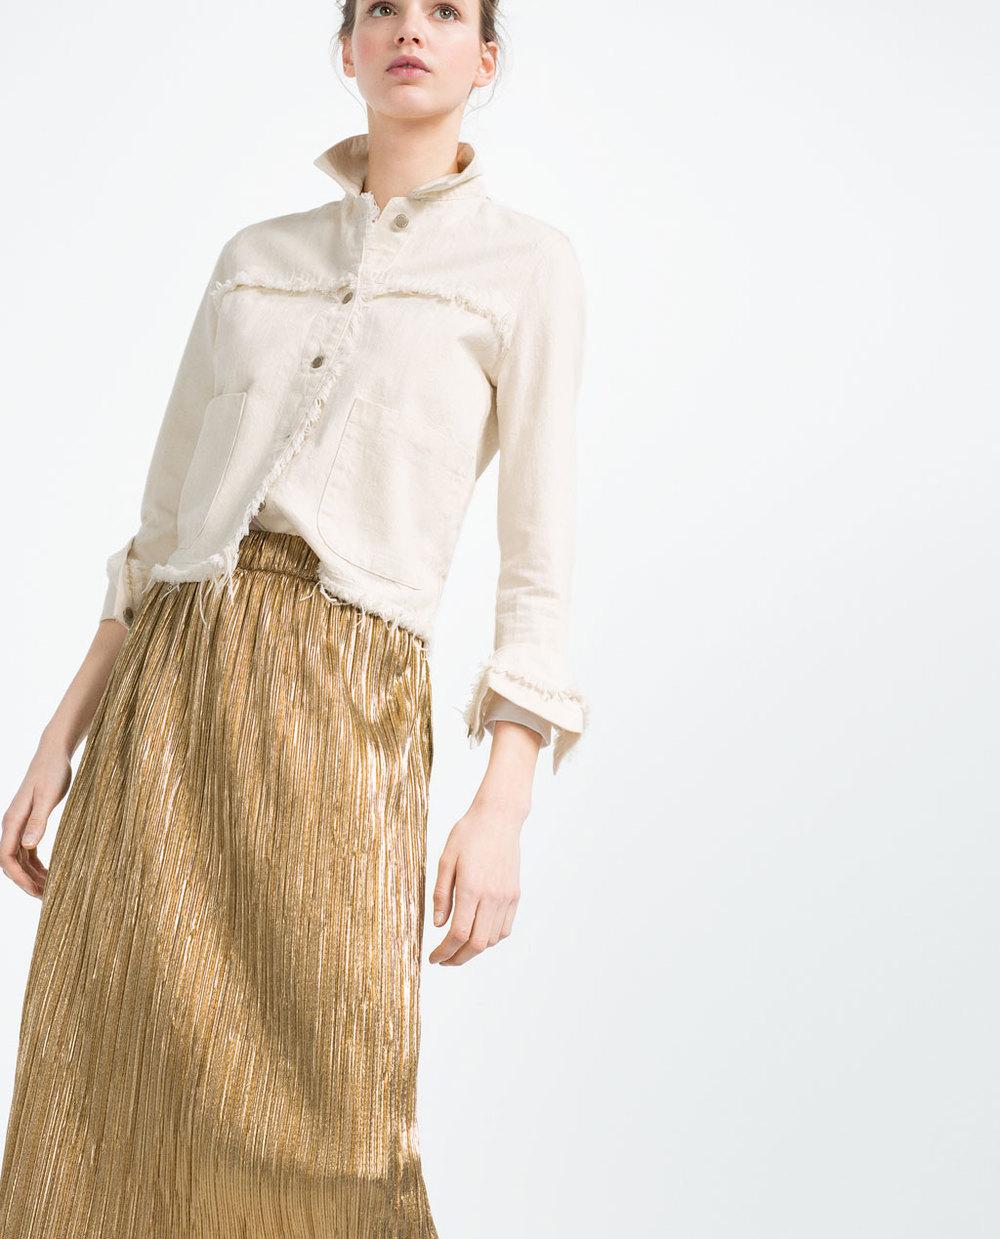 http://www.zara.com/uk/en/woman/skirts/view-all/accordion-pleat-skirt-c719016p3187092.html